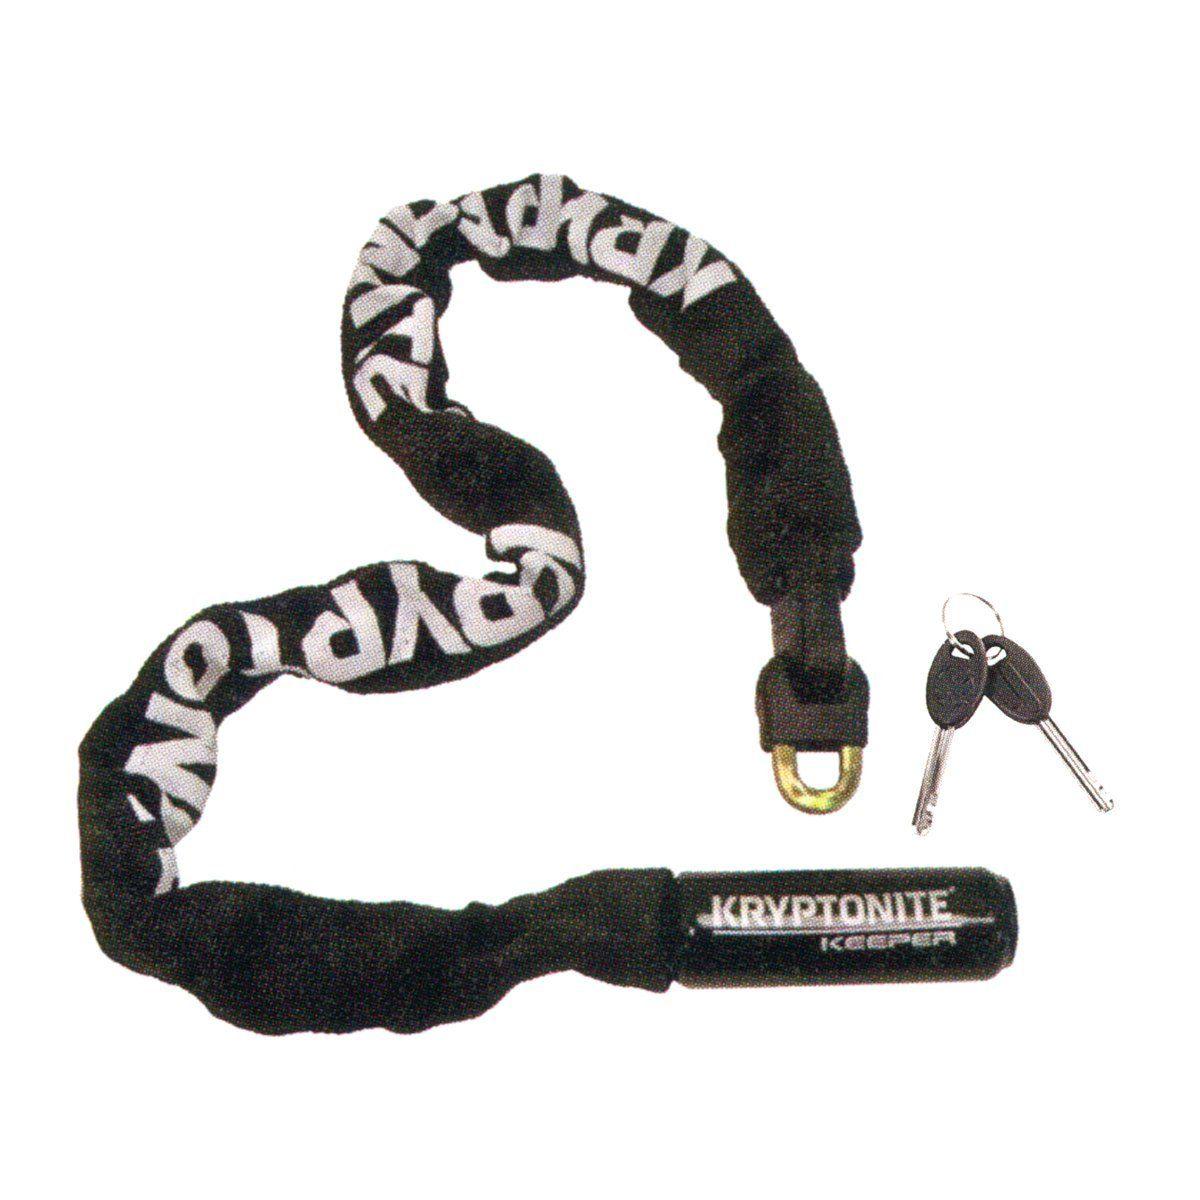 NEW Kryptonite 1090 Evolution Series 4 Chain Lock 3/' 90cm